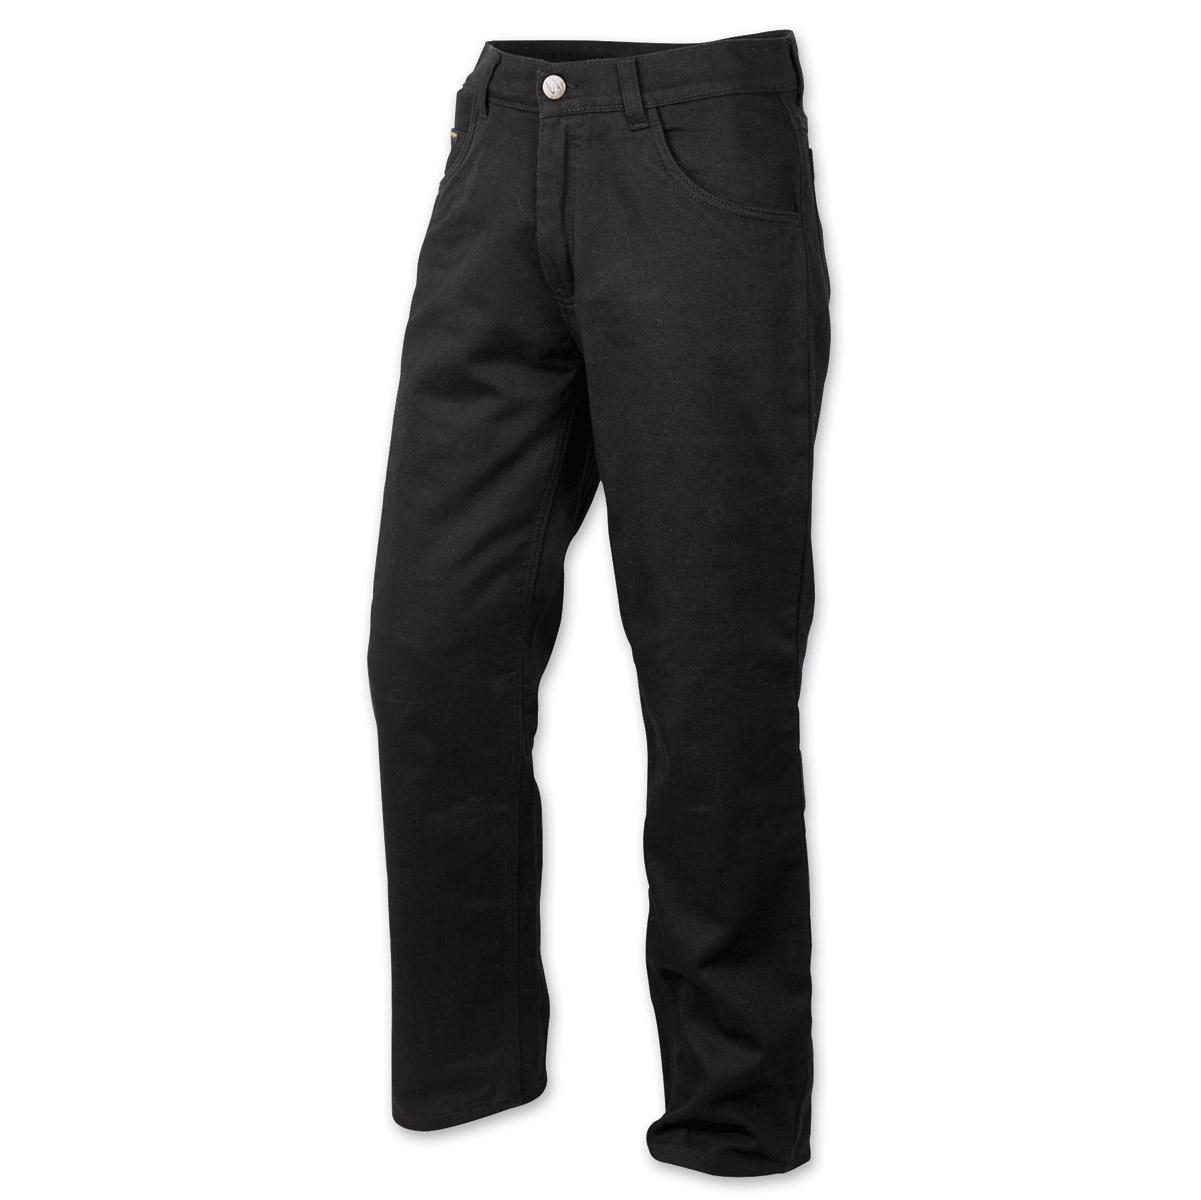 Scorpion EXO Men's Covert Black Jeans